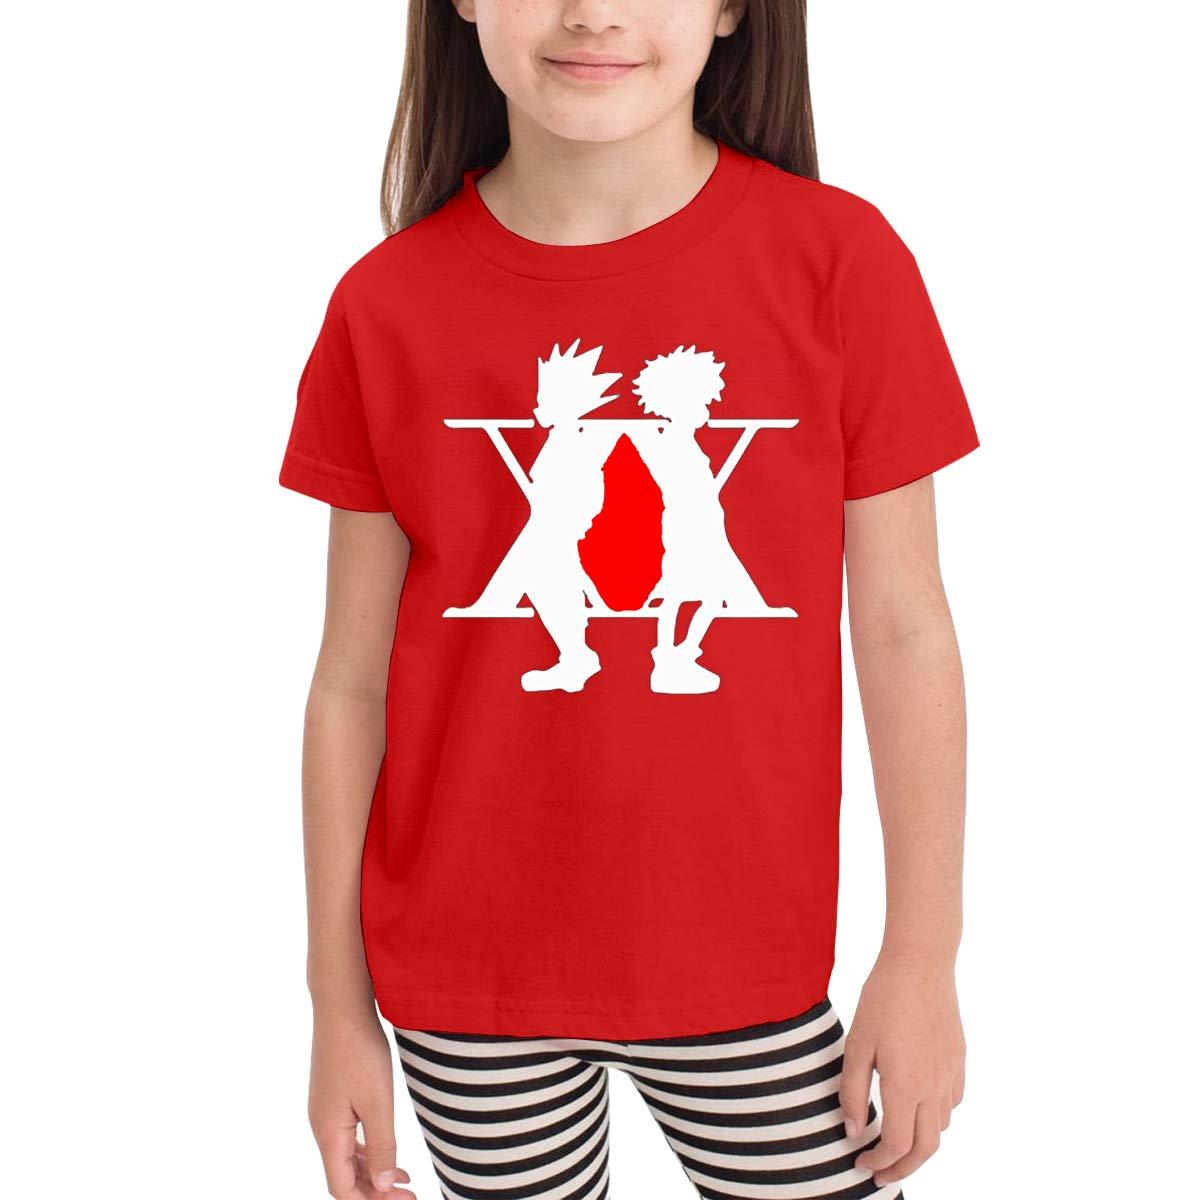 Hunter X Hunter Anime Manga Girls and Boys Crew T-Shirts 100/% Soft Cotton Short Shirts